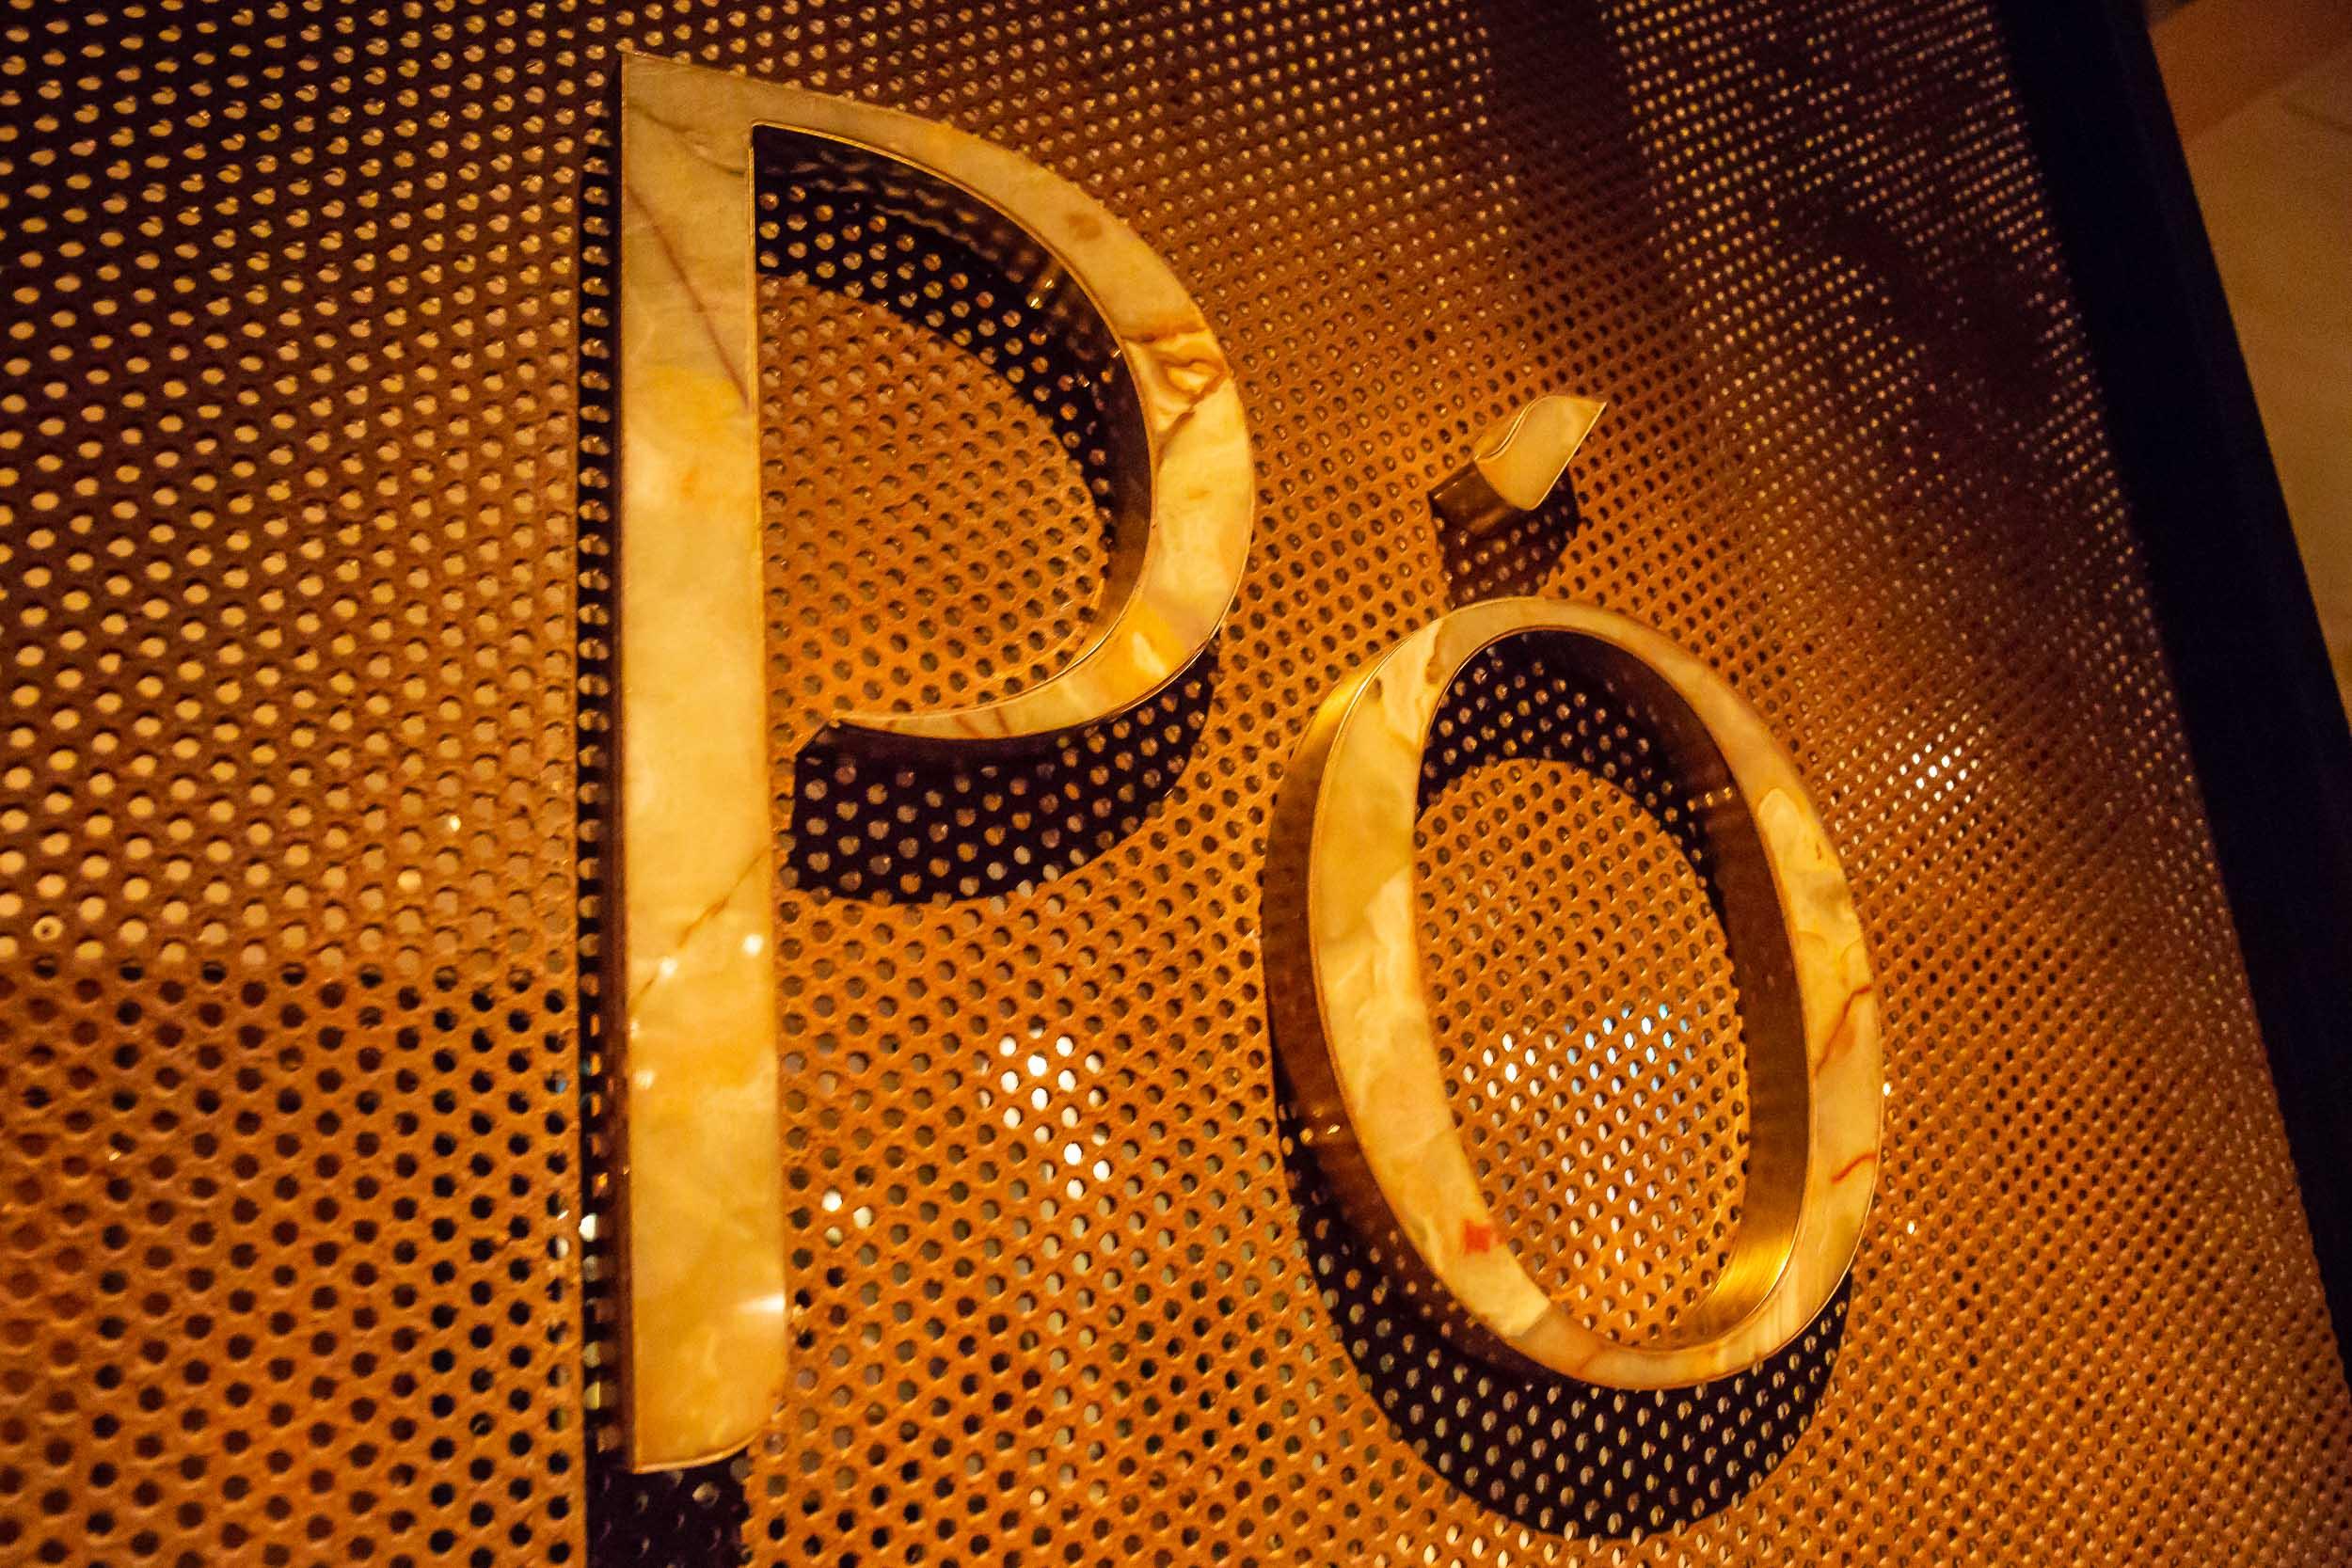 Po Restaurant, as in popo (Mandarin for grandmother).